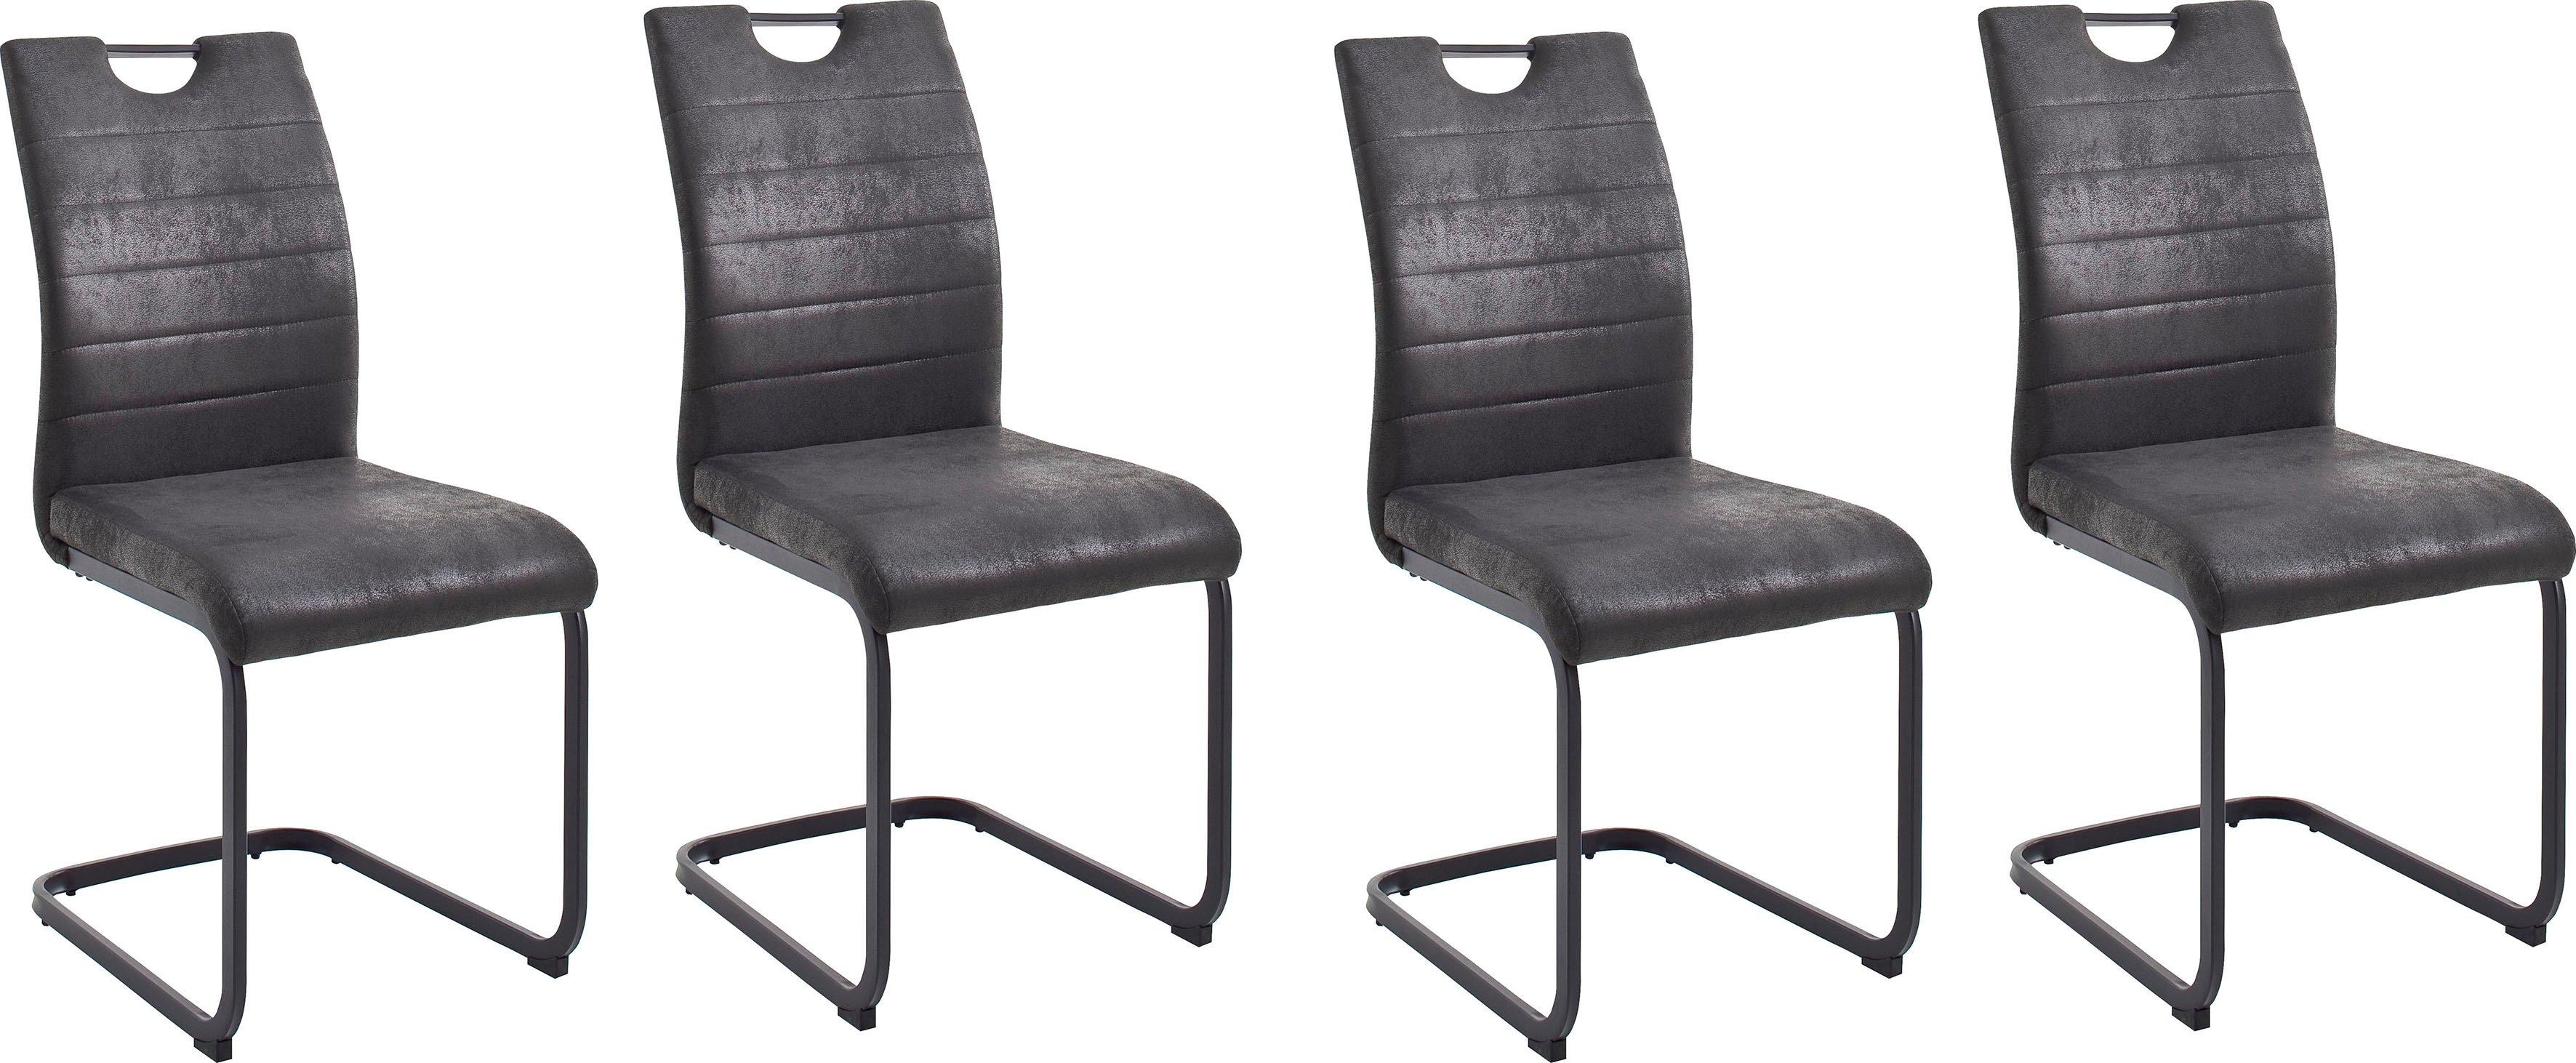 MCA furniture eetkamerstoel Bilbao met bekleding in vintage-look, belastbaar tot 120 kg (set, 4 stuks) veilig op otto.nl kopen